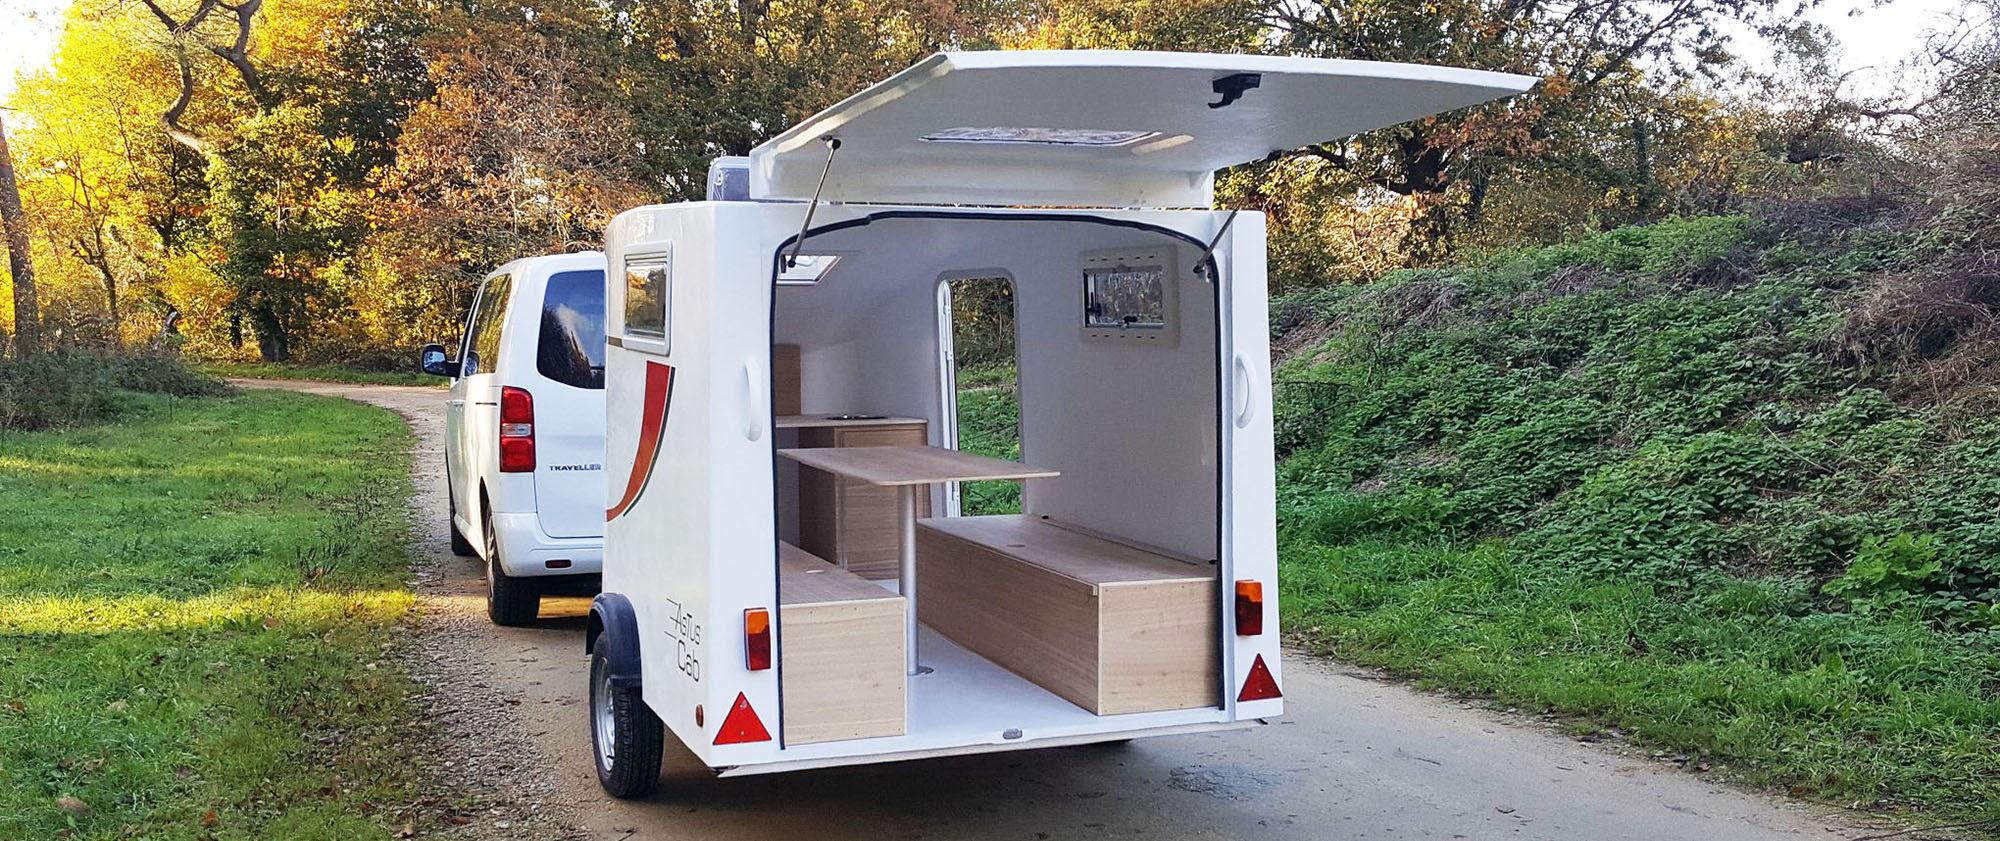 Astuscab : mini-caravane teardrop